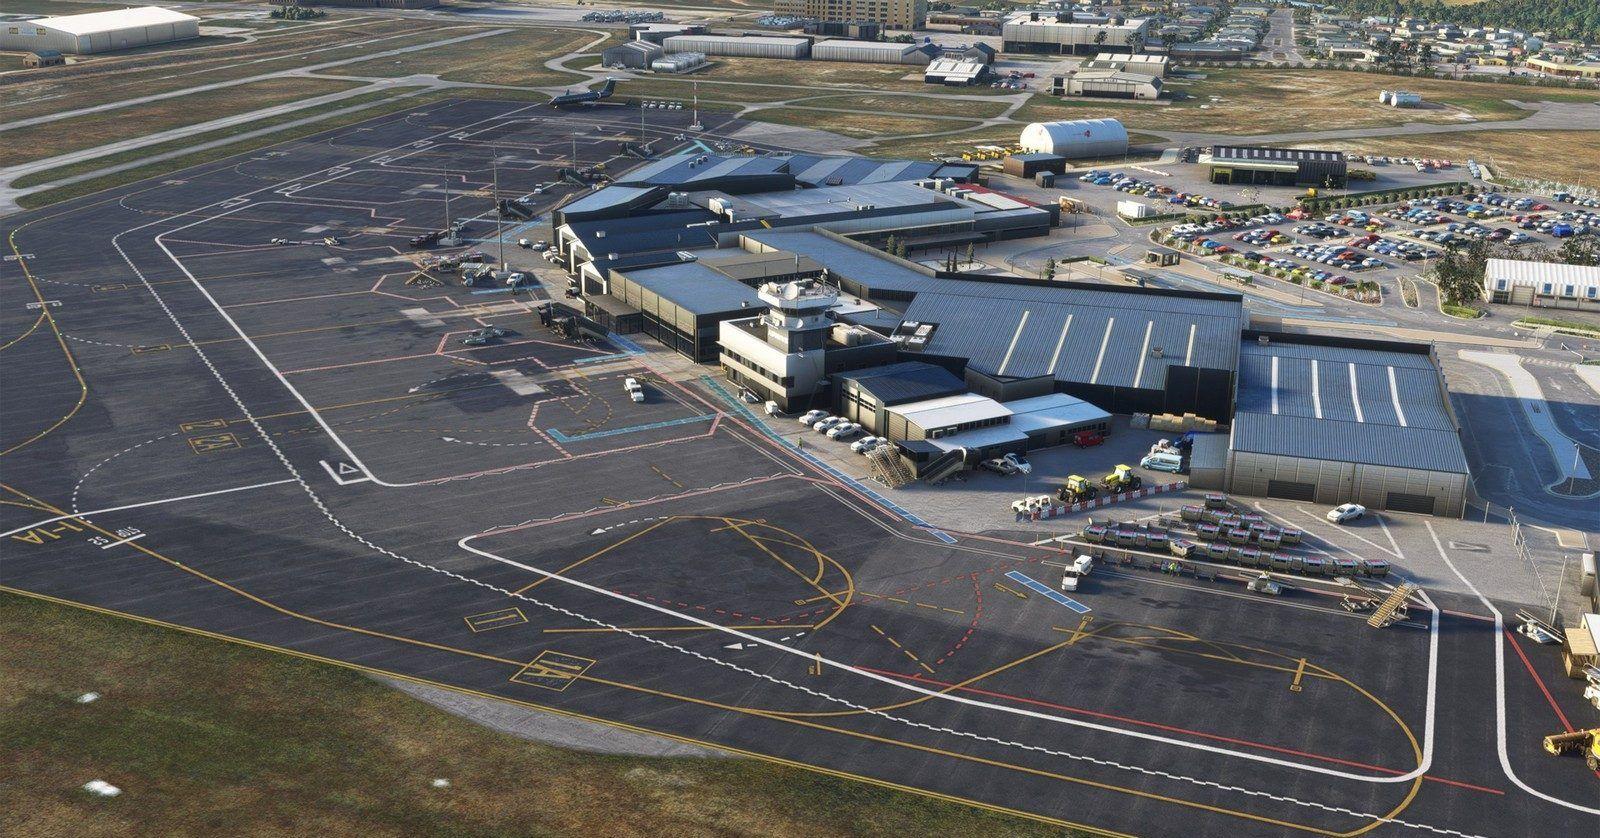 MSFS NZQN Queenstown Airport